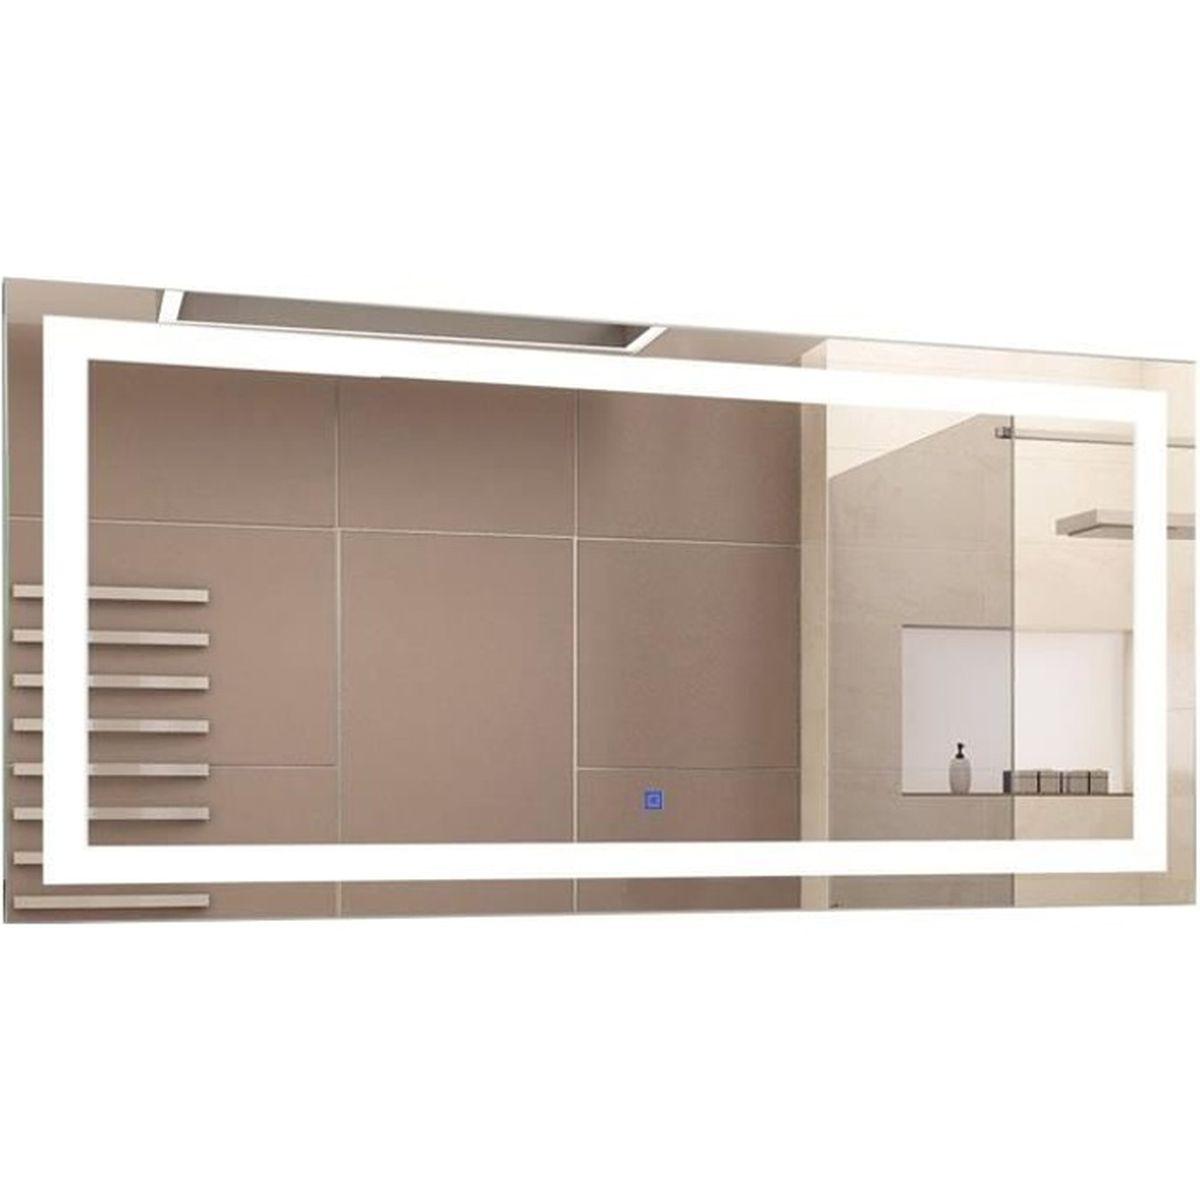 Miroir Eclairant Salle De Bain miroir lumineux led salle de bain miroir rectangulaire 53 w